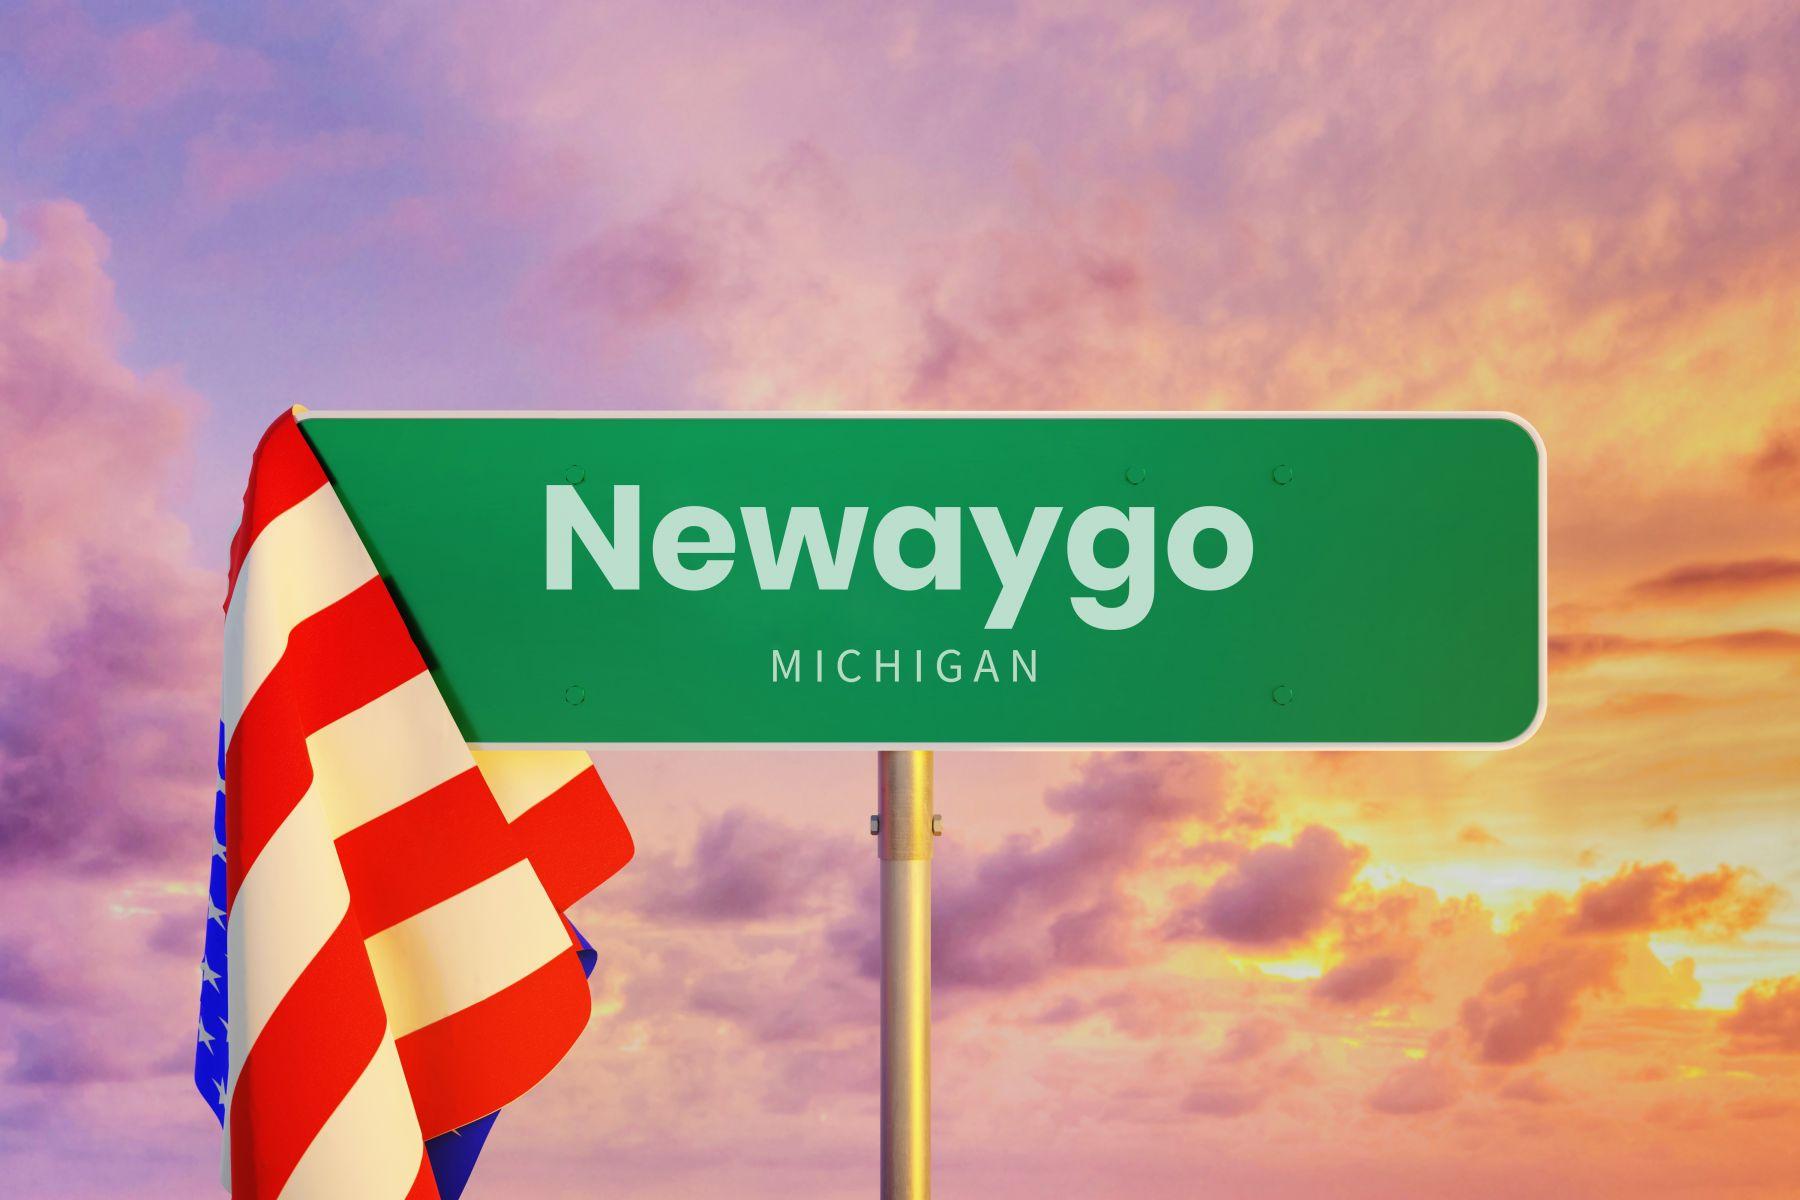 Newaygo